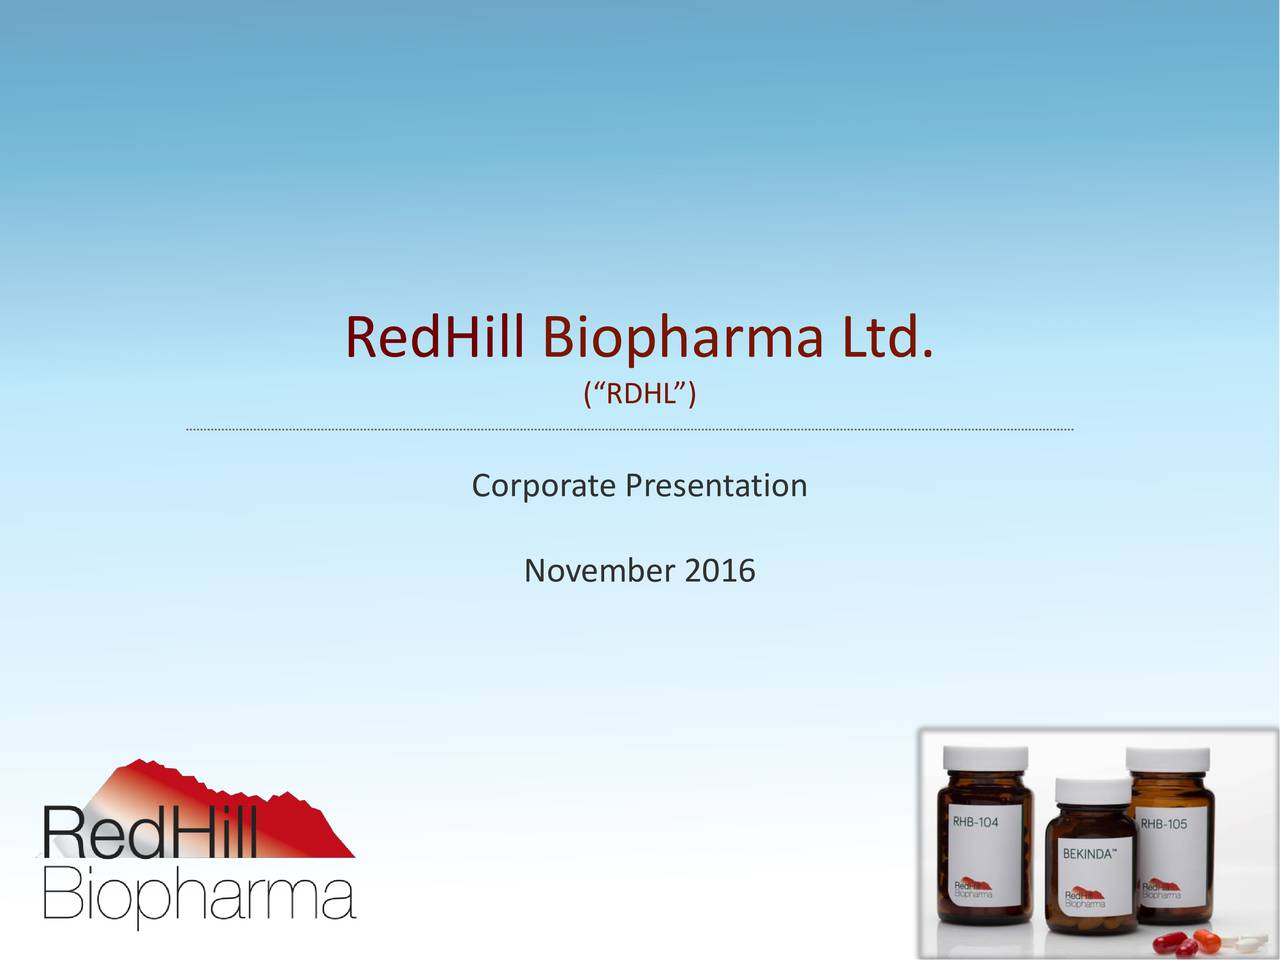 (RDHL) Corporate Presentation November 2016